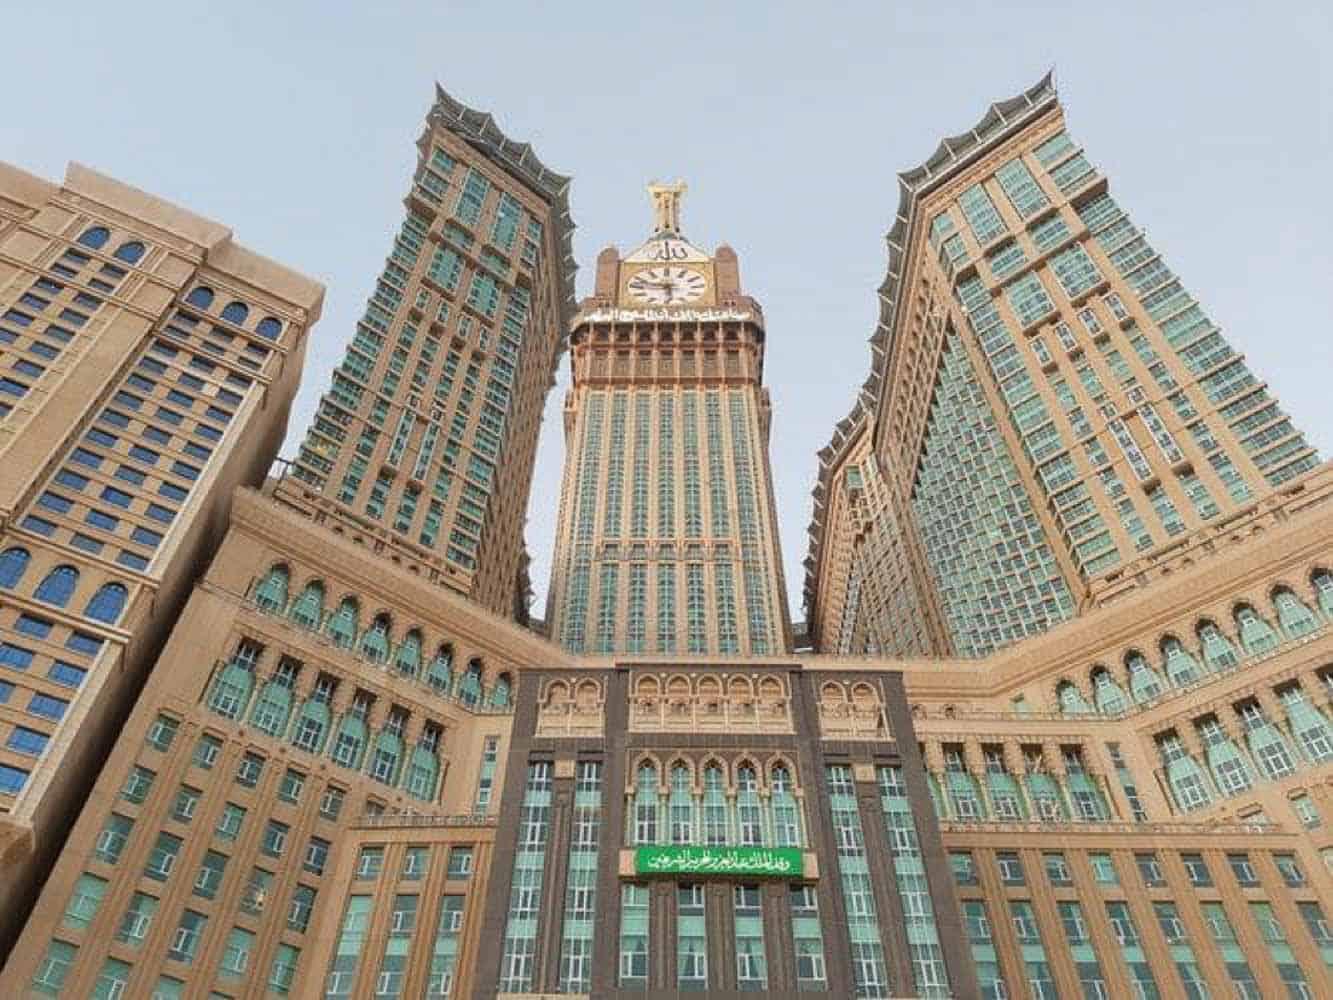 Abraj Al-Bait aka The Royal Clock Tower